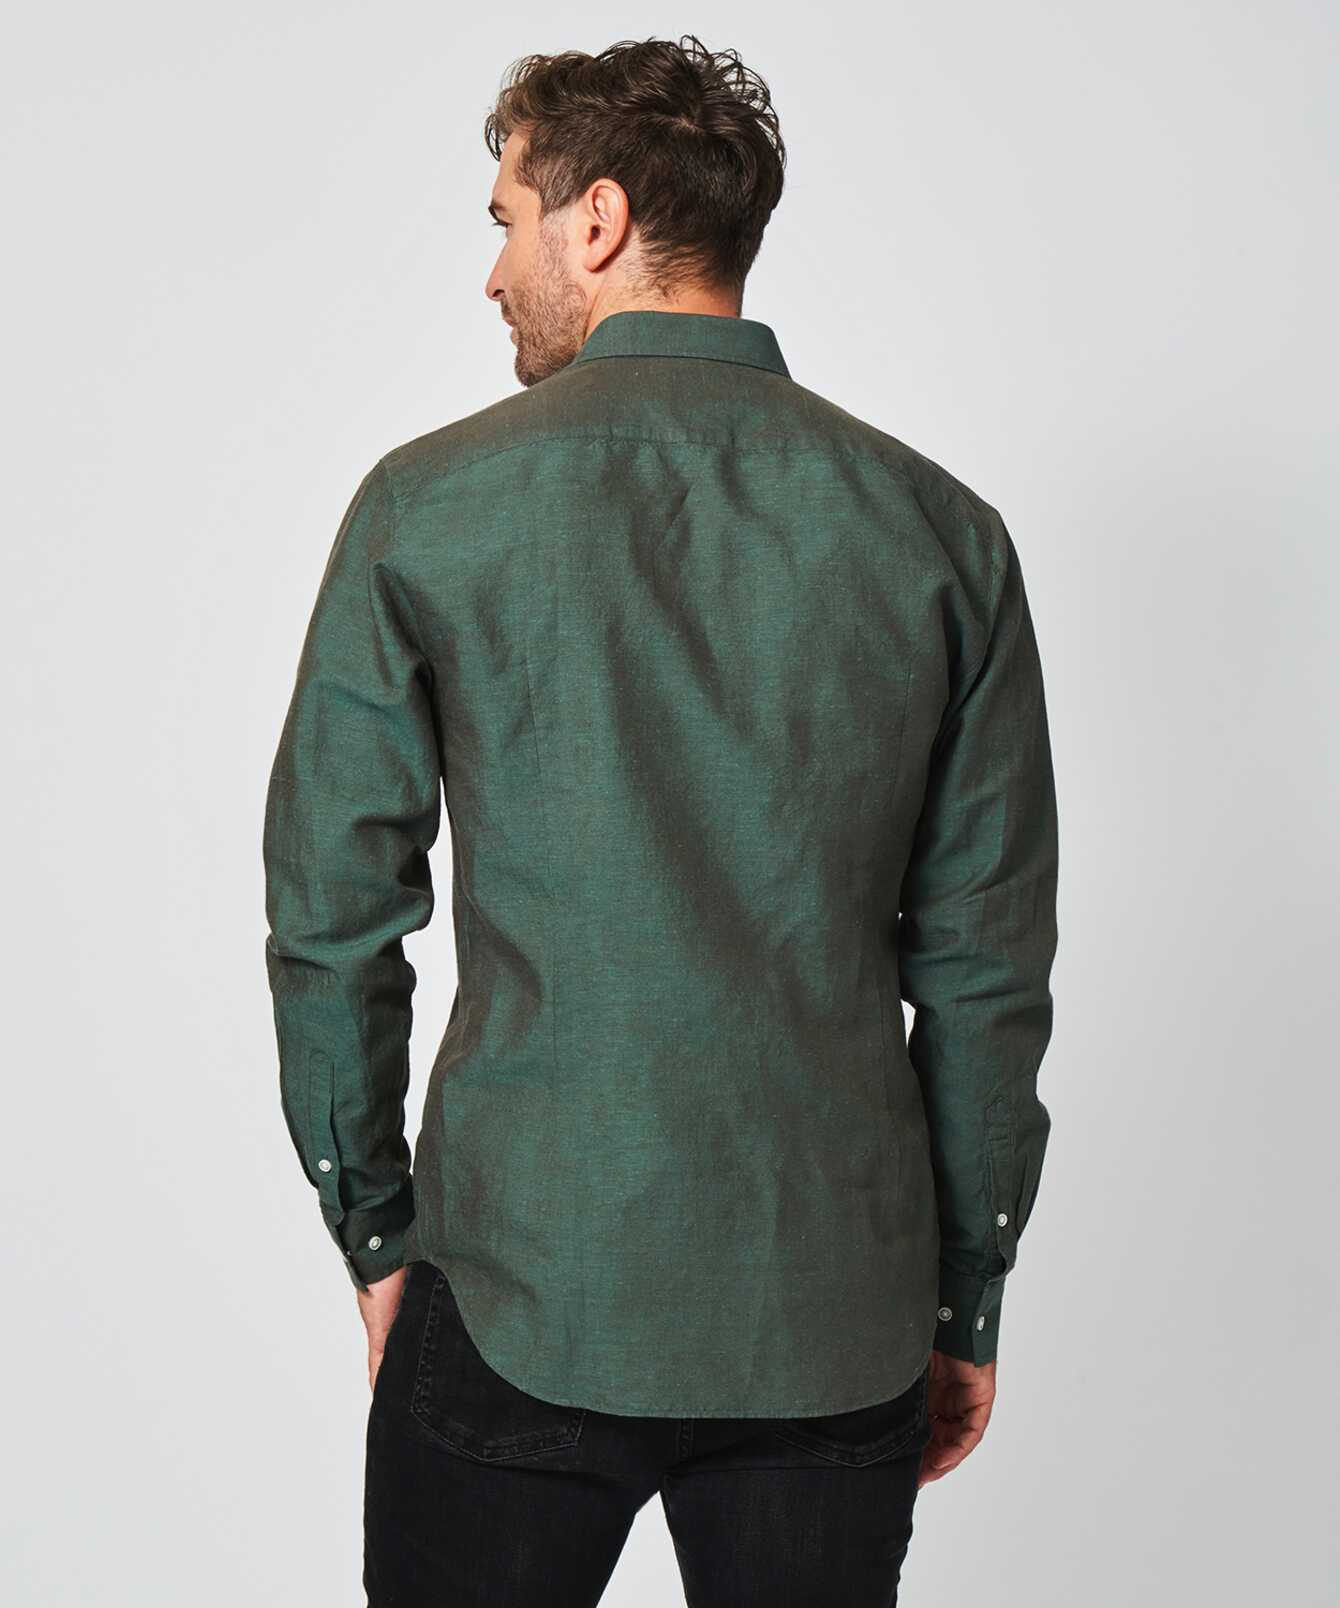 Skjorta Portofino Linne Grön  The Shirt Factory